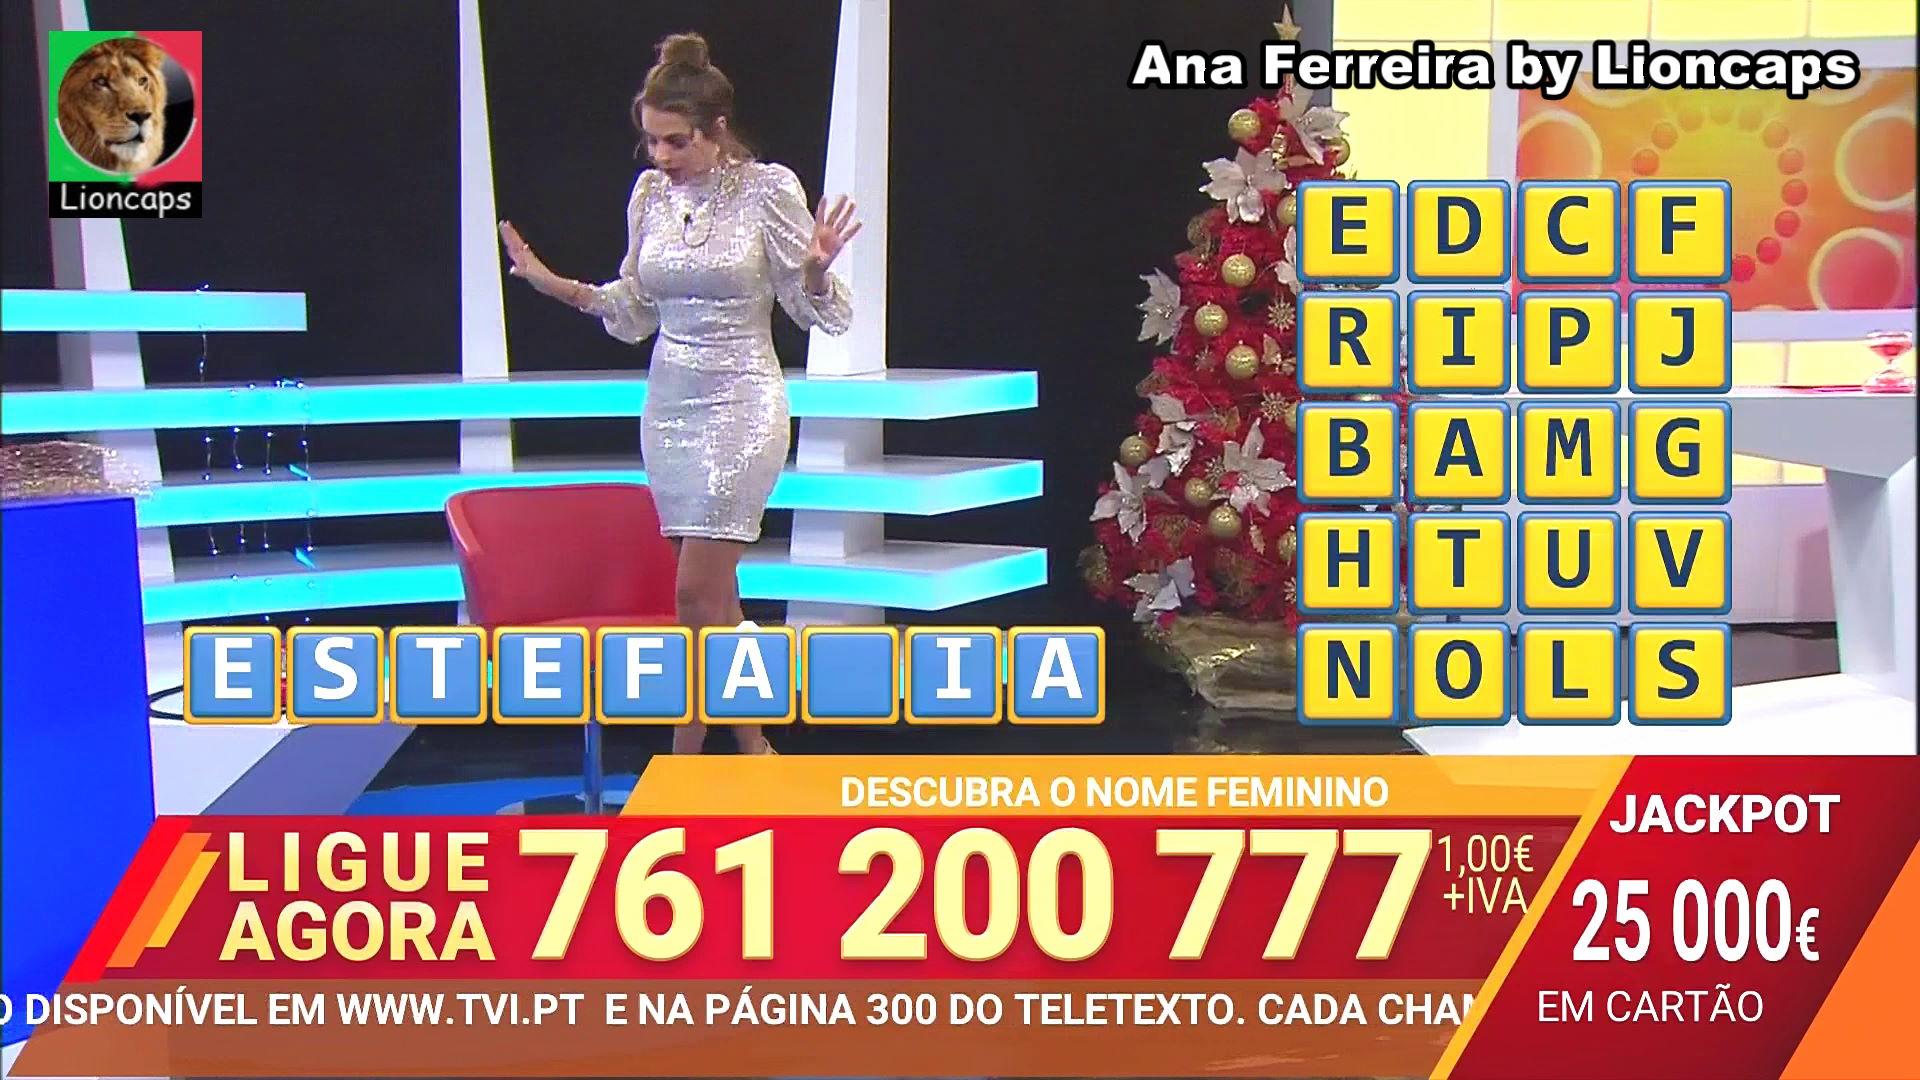 638144925_ana_ferreira_vs200225_0759_122_357lo.JPG